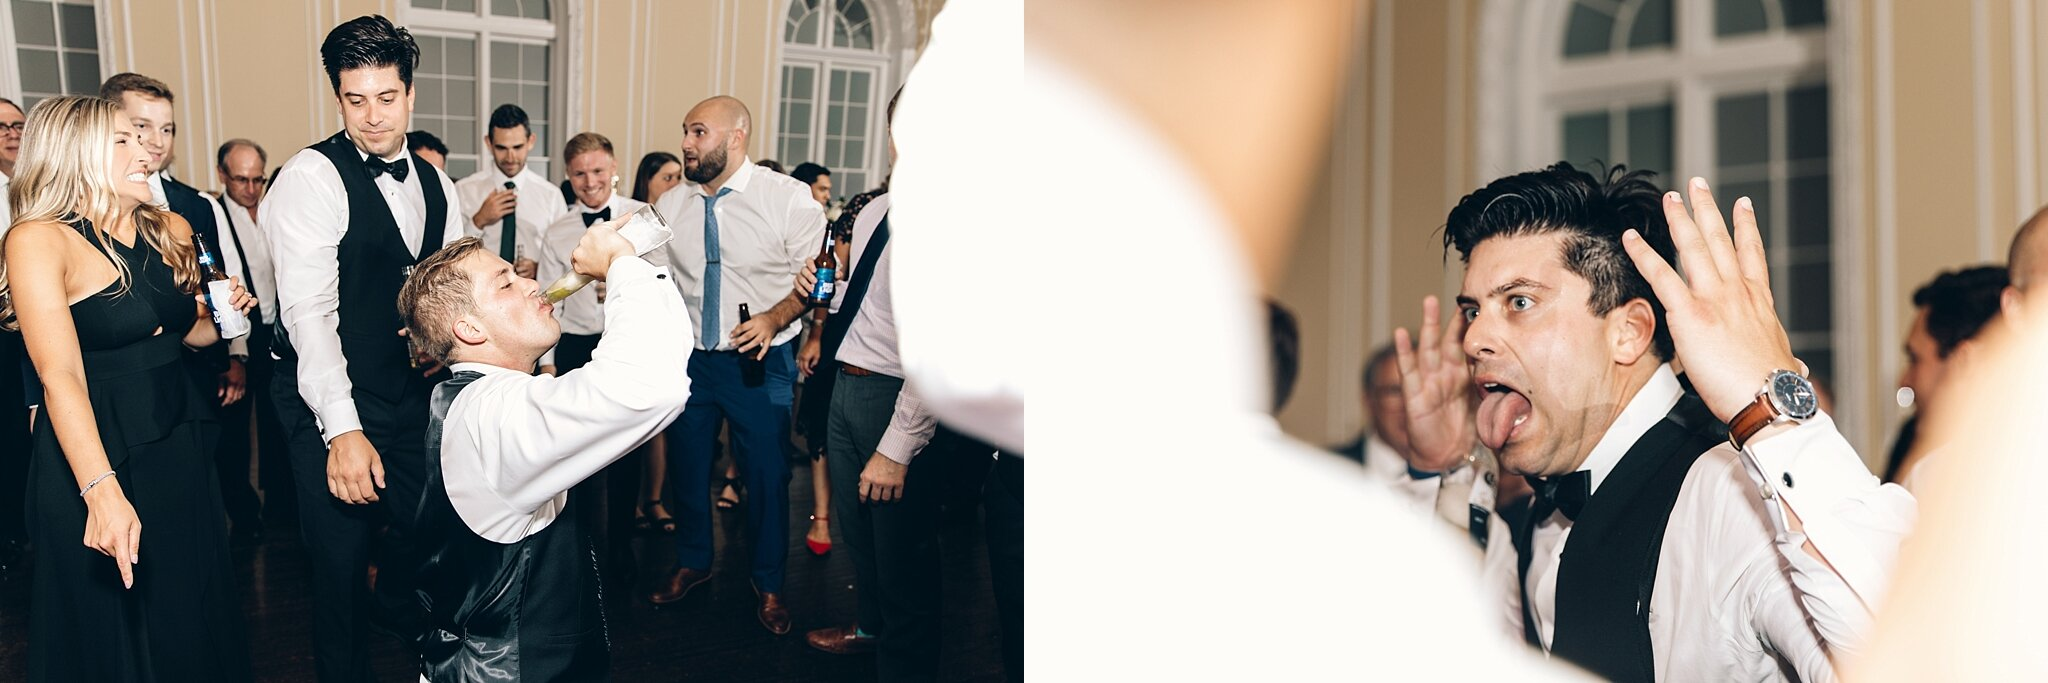 patrick-henry-ballroom-wedding-roanoke_0566.jpg